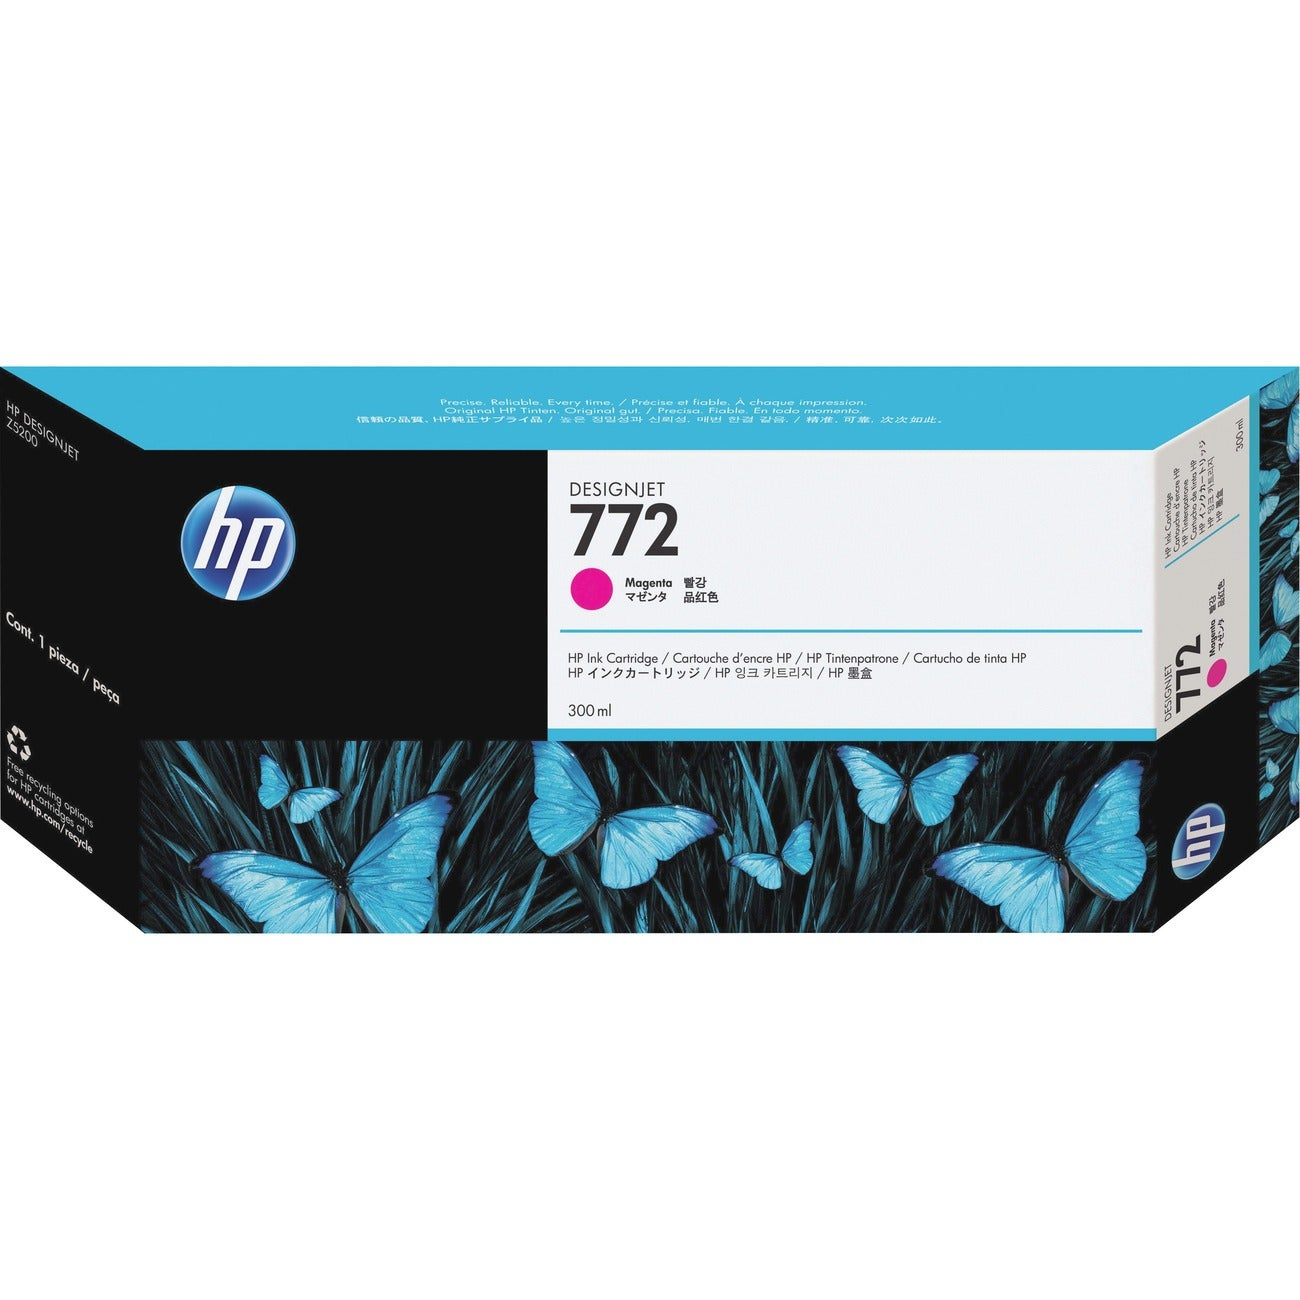 HP 772 Ink Cartridge - Magenta